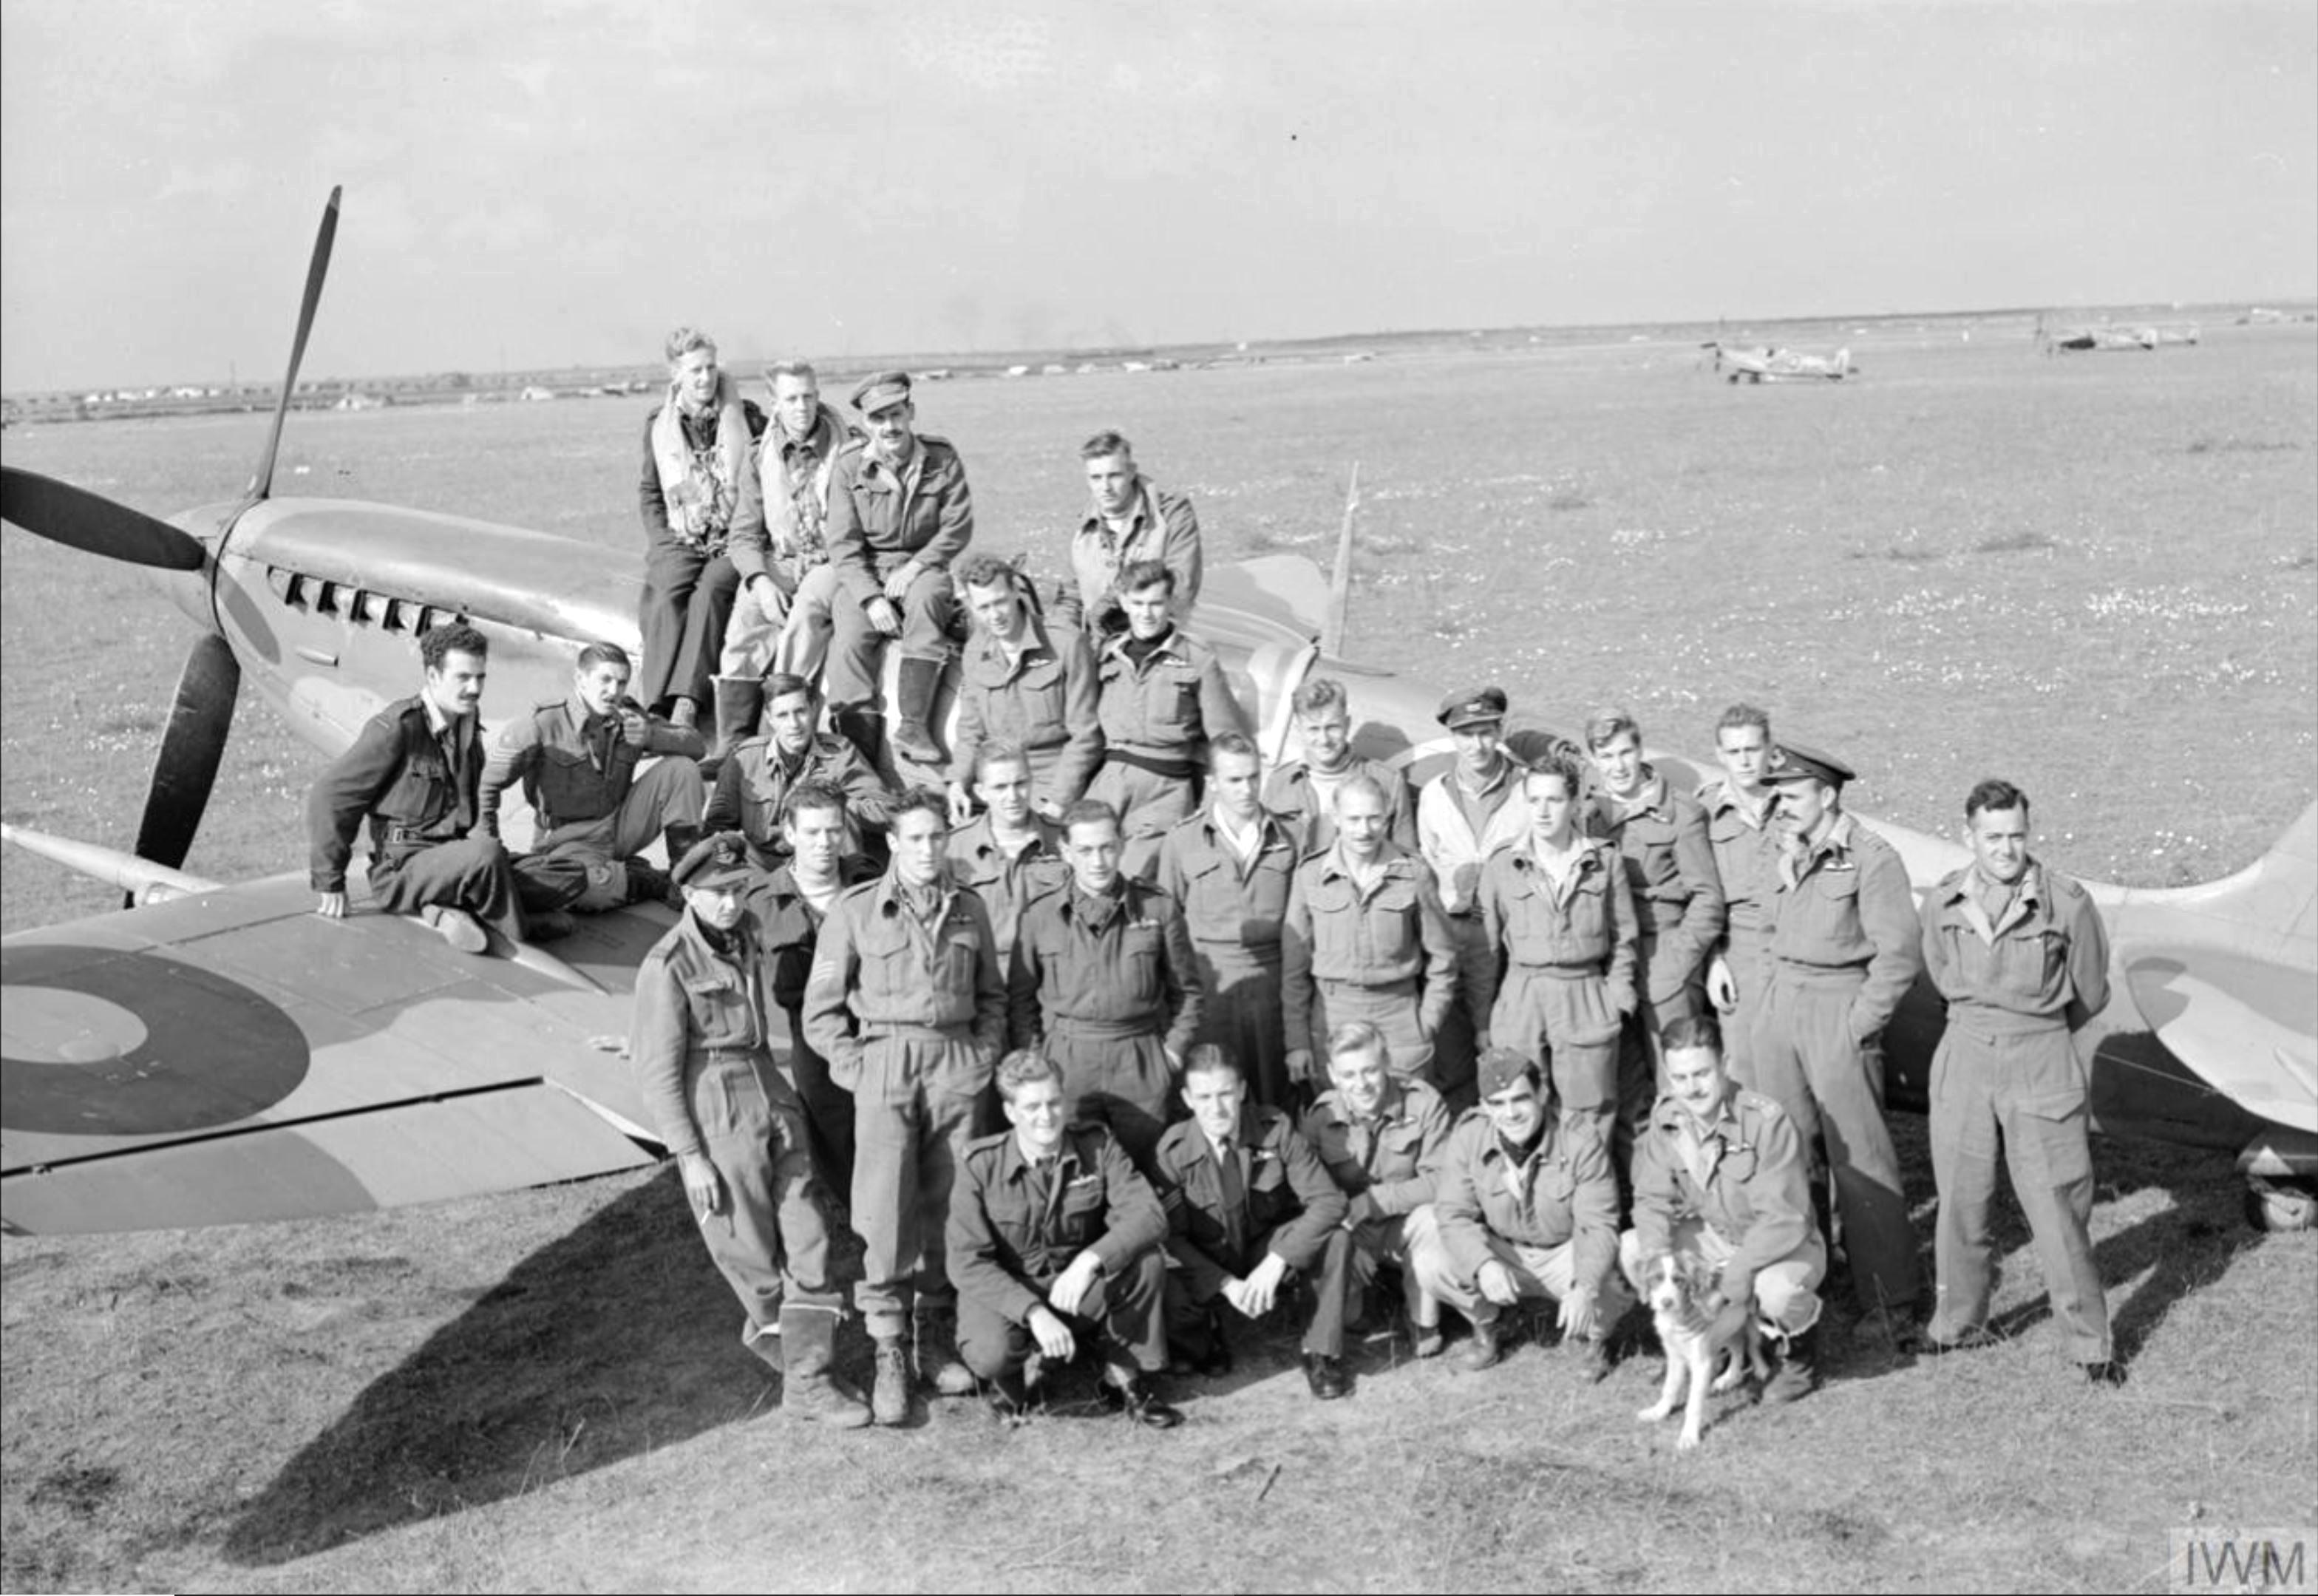 Aircrew RAF 145qn Sqn Ldr LC Wade at Triolo landing ground Italy 1943 IWM CNA1978